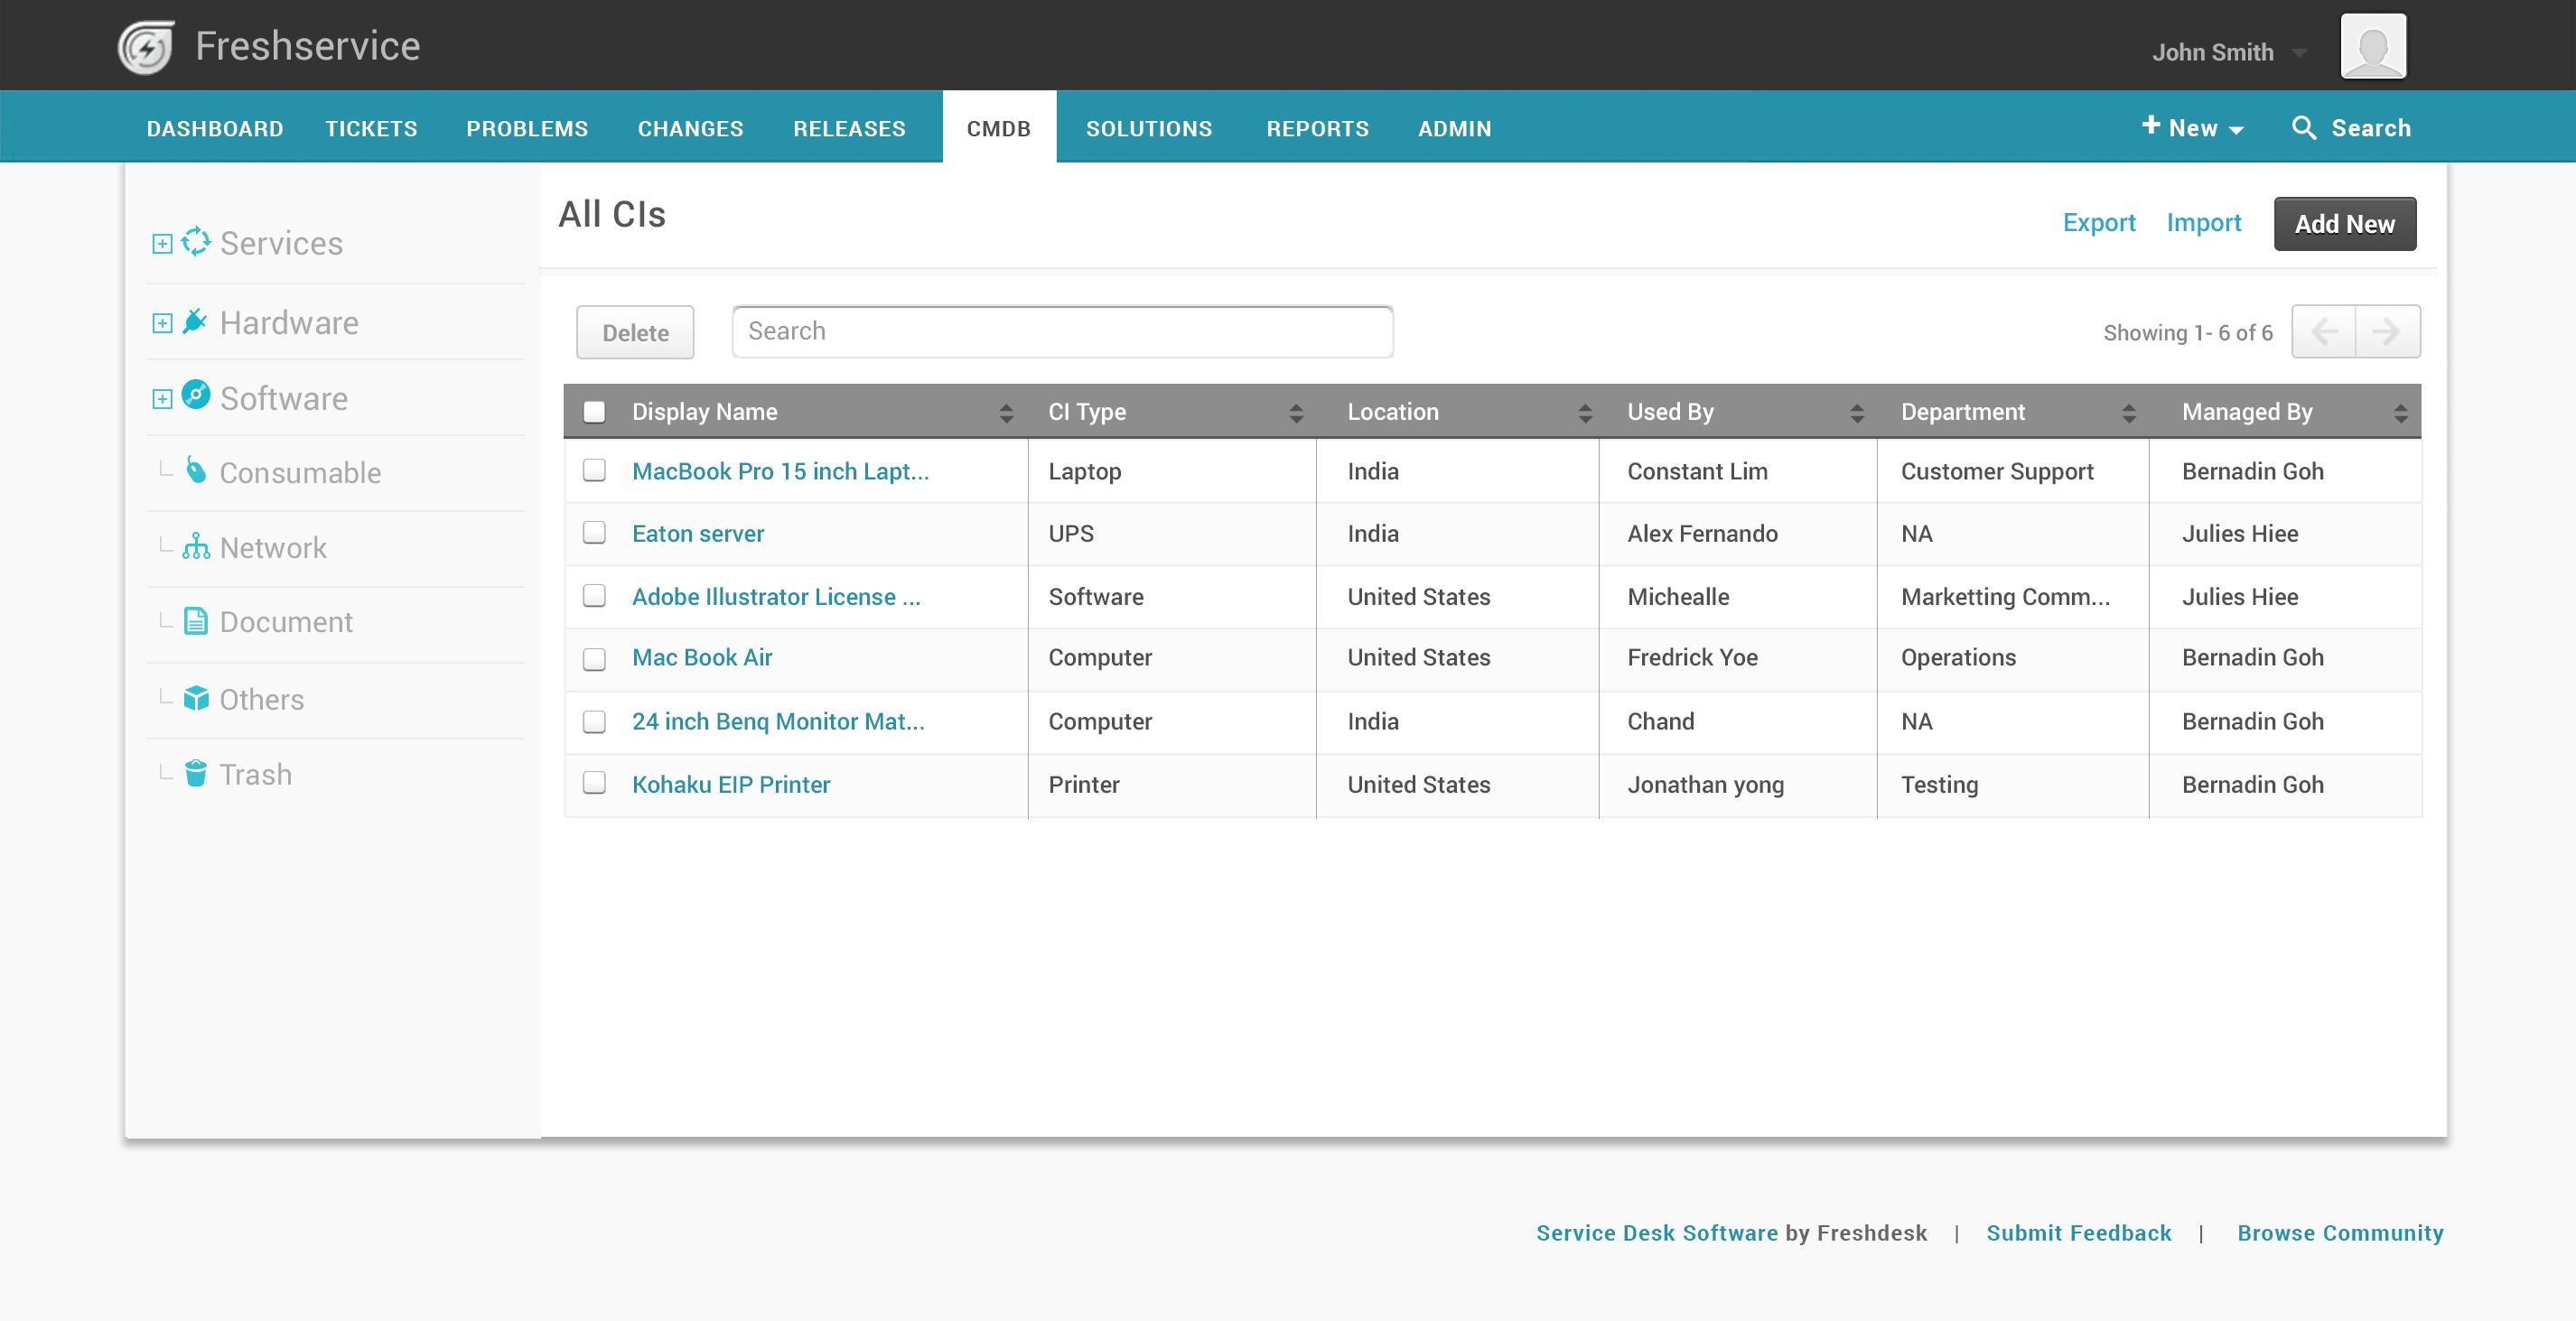 Freshservice Software - Freshservice IT asset management